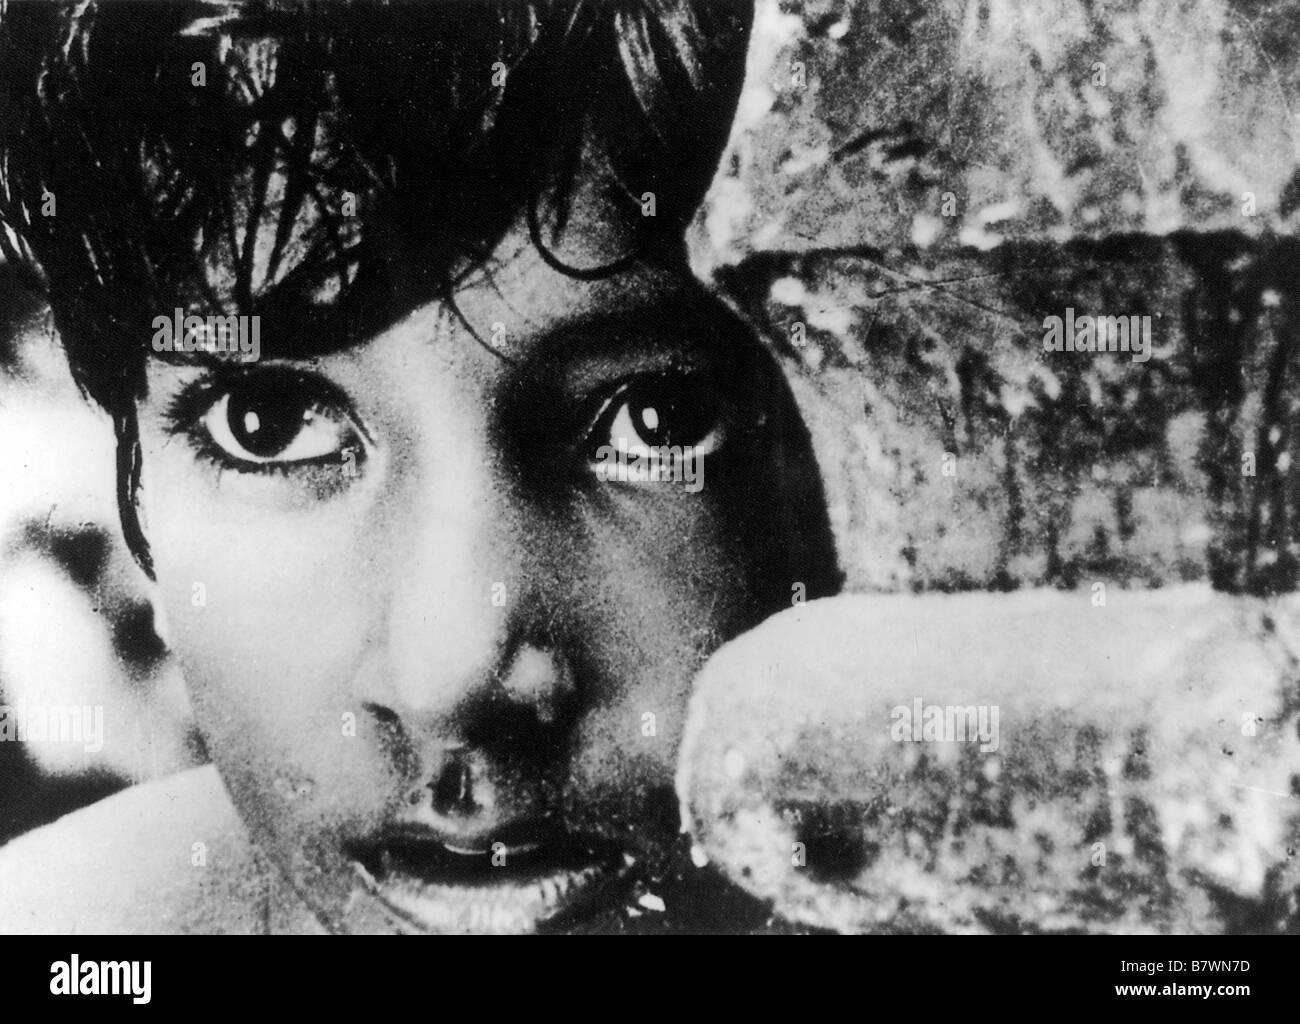 Pather Panchali  Song of the Road  Year: 1955 India Director: Satyajit Ray Subir Banerjee Stock Photo